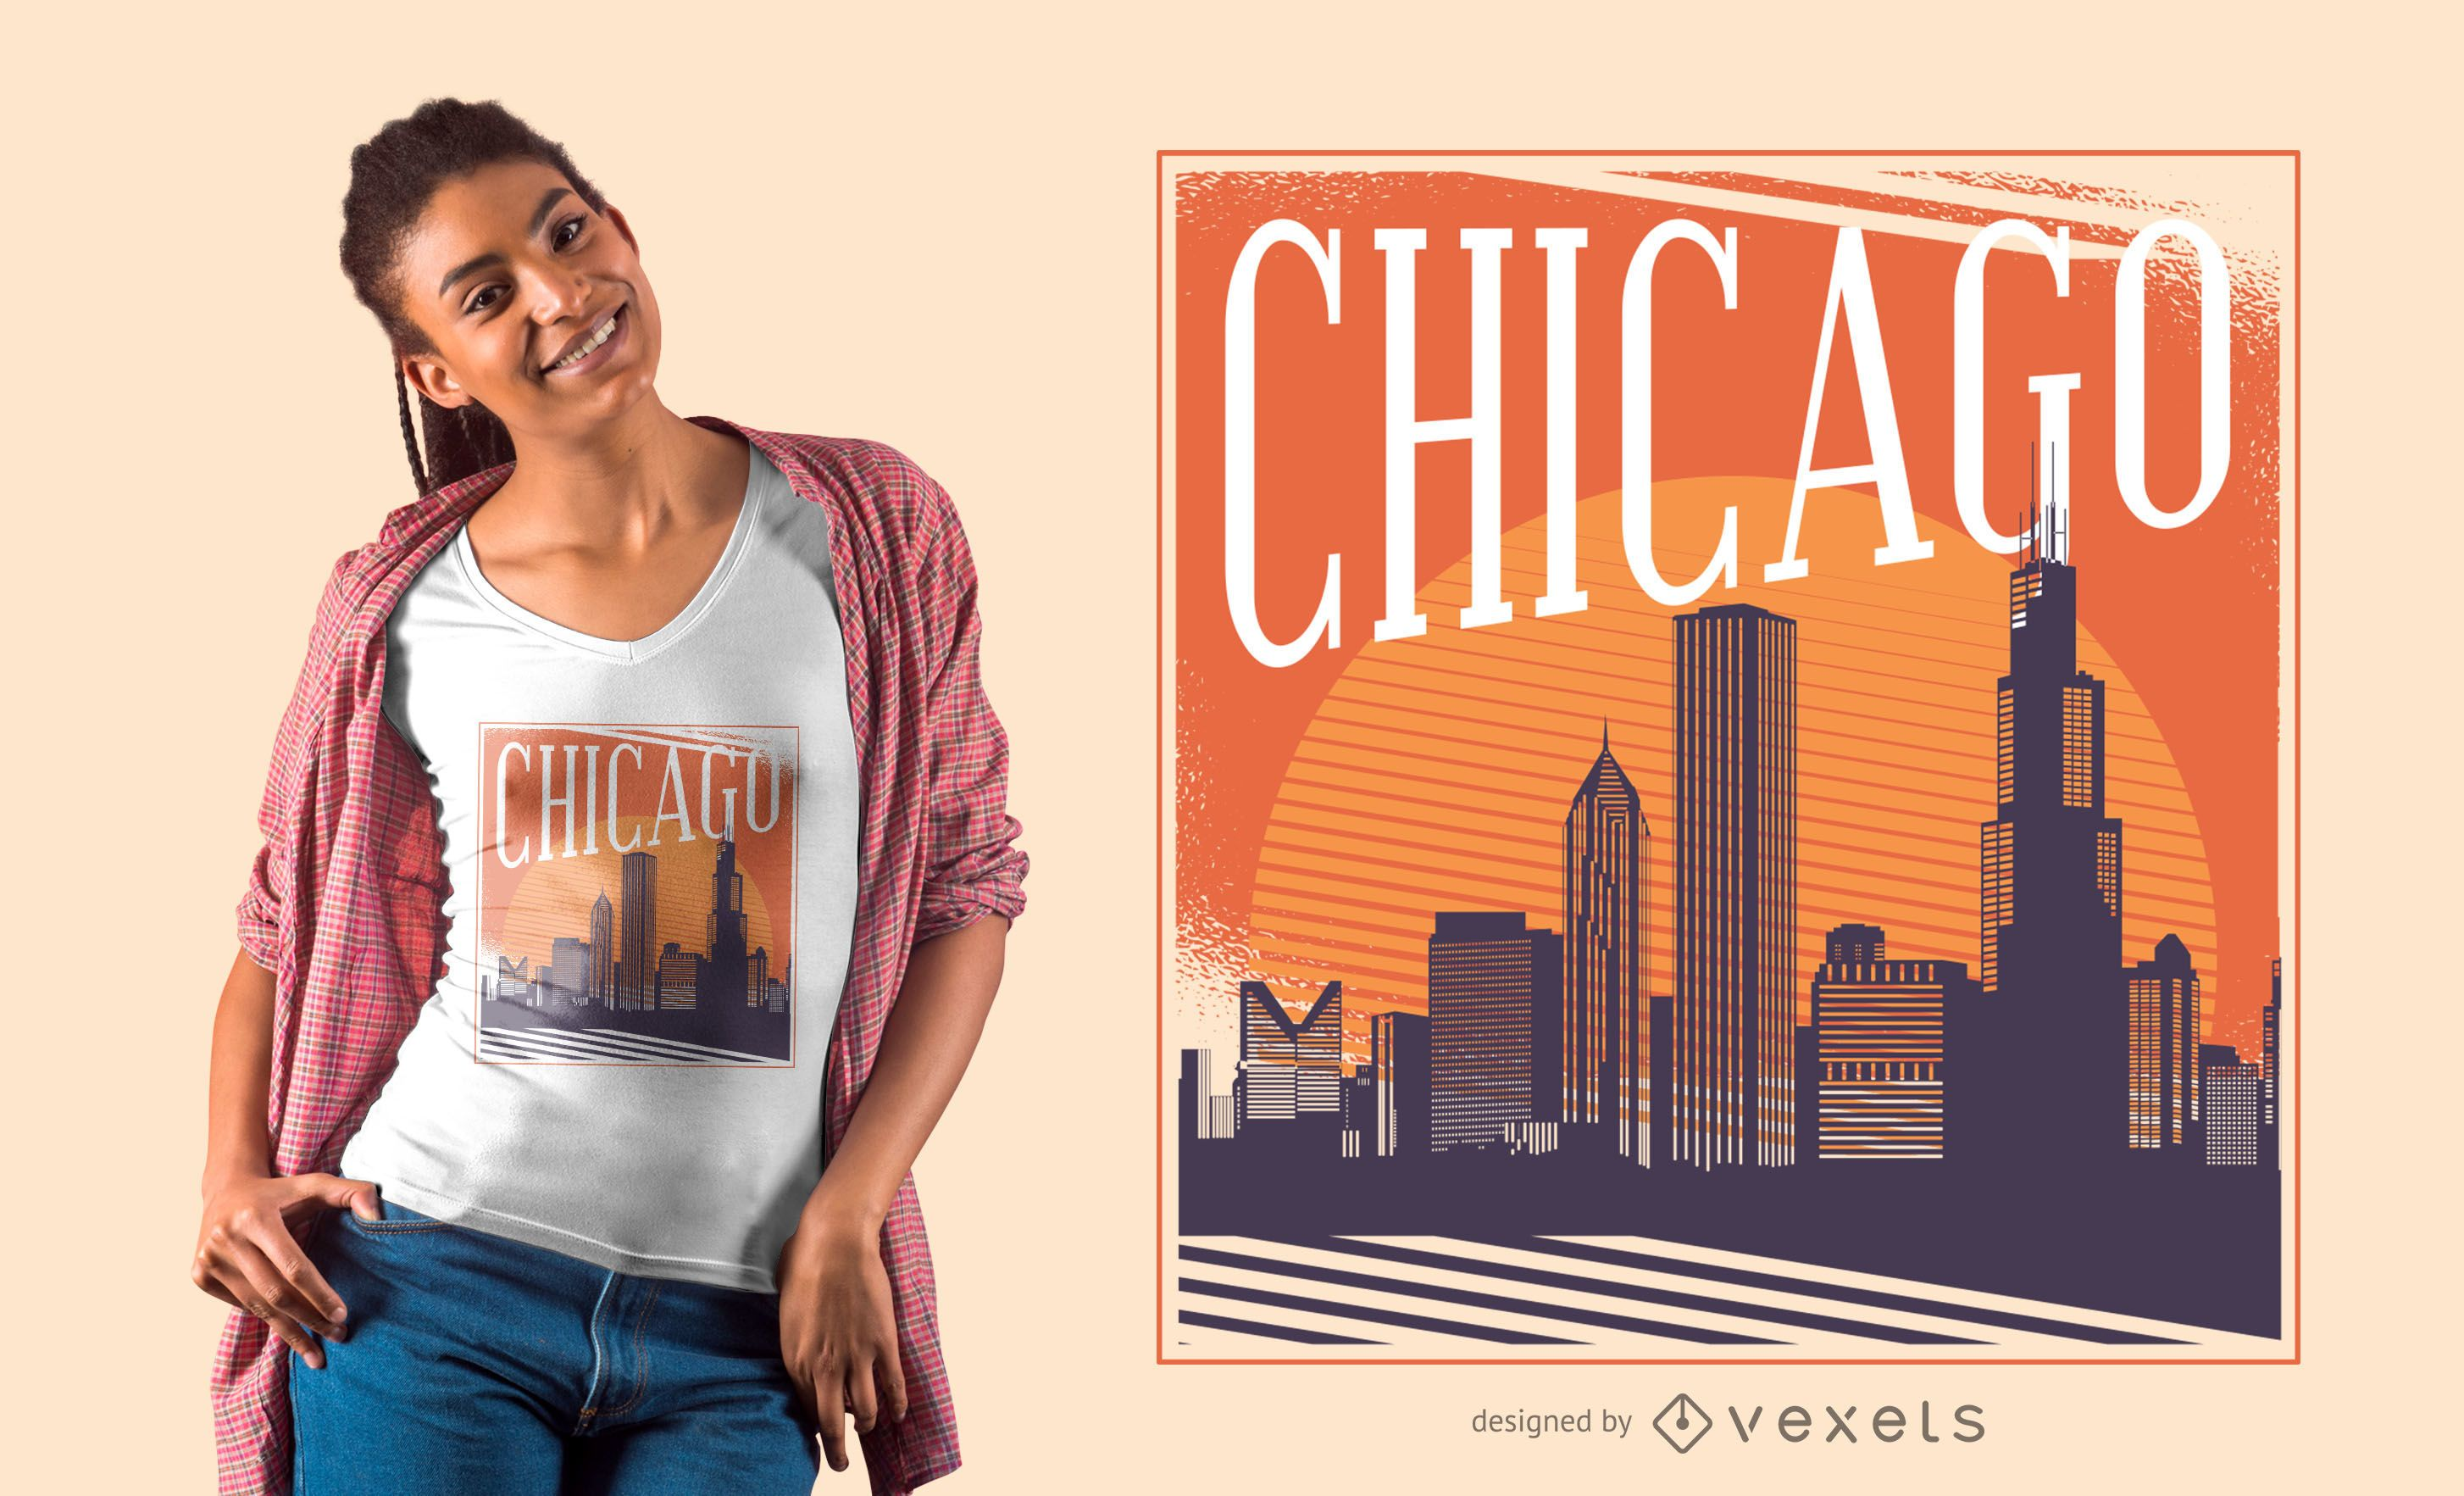 Chicago skyline t-shirt design